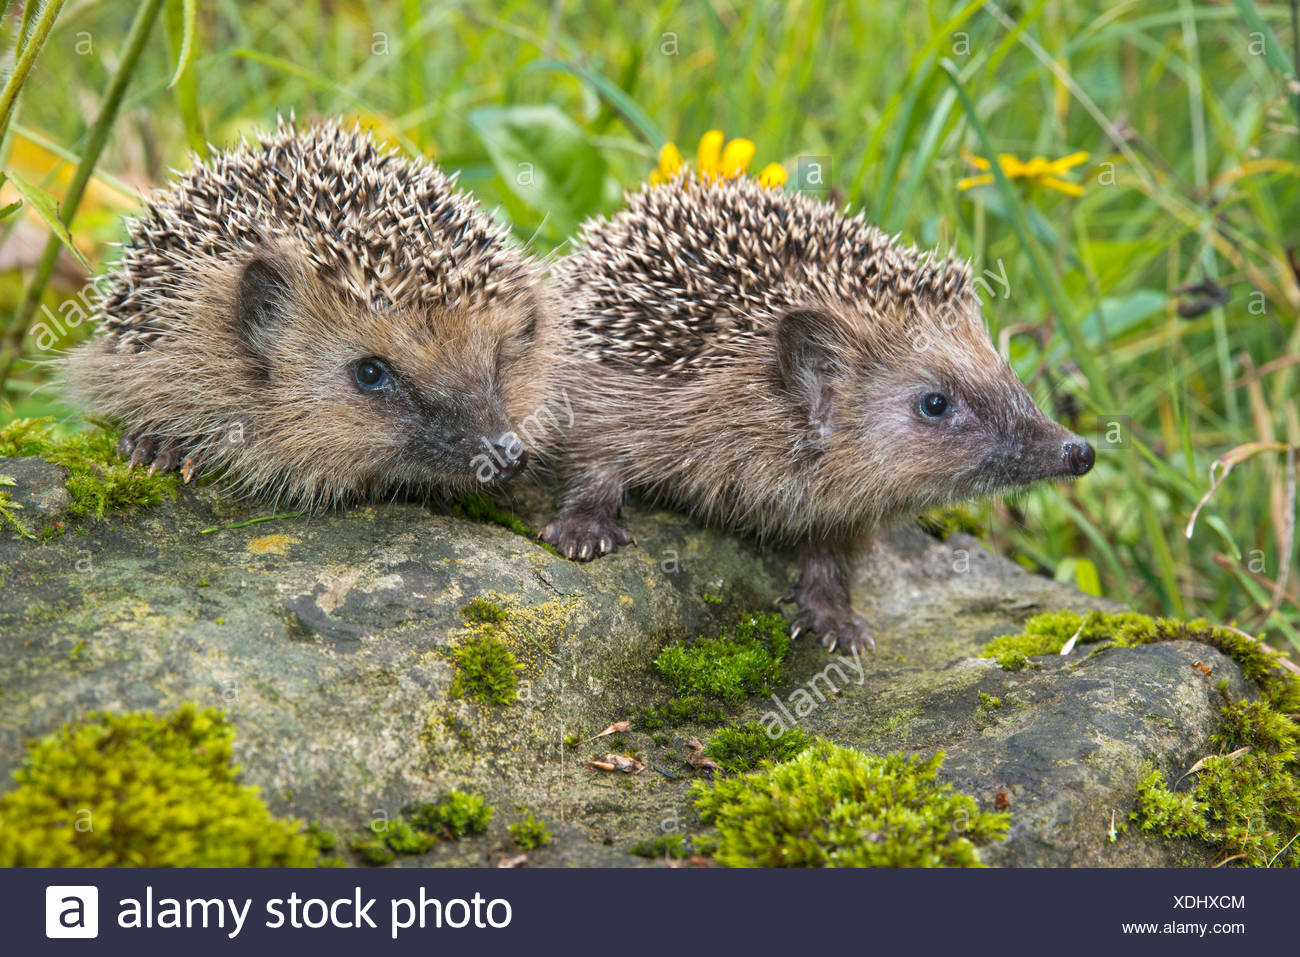 European hedgehog (Erinaceus europaeus), Tyrol, Austria - Stock Image